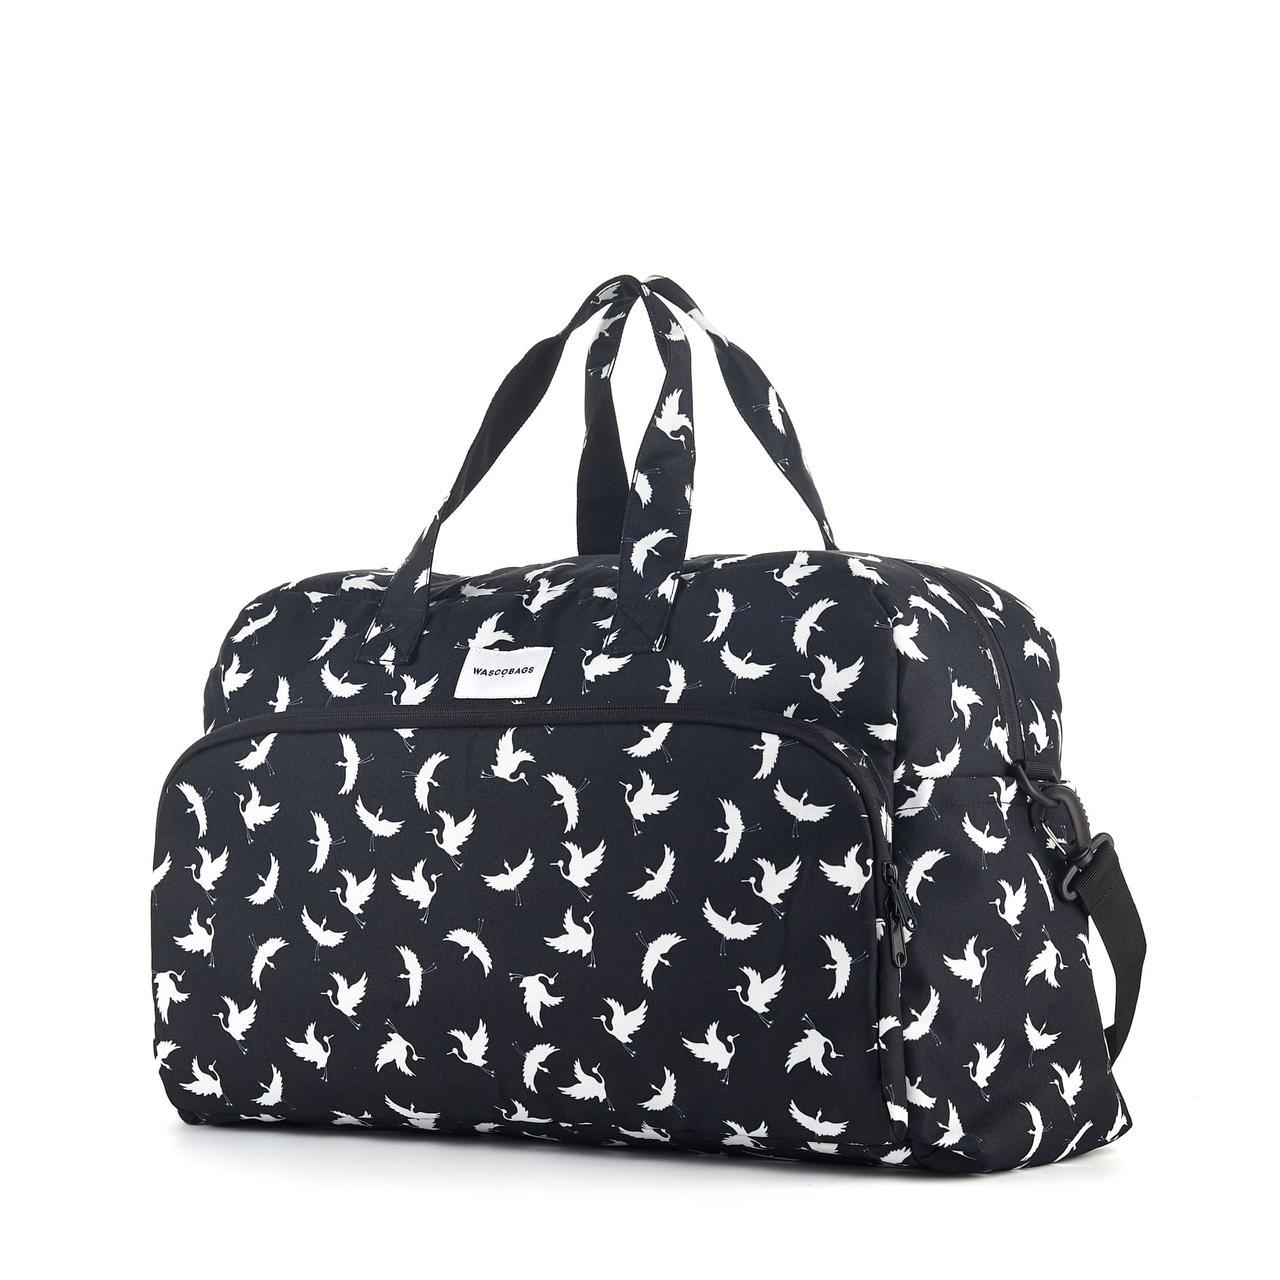 Дорожная сумка Wascobags Milano Storks (33 L)